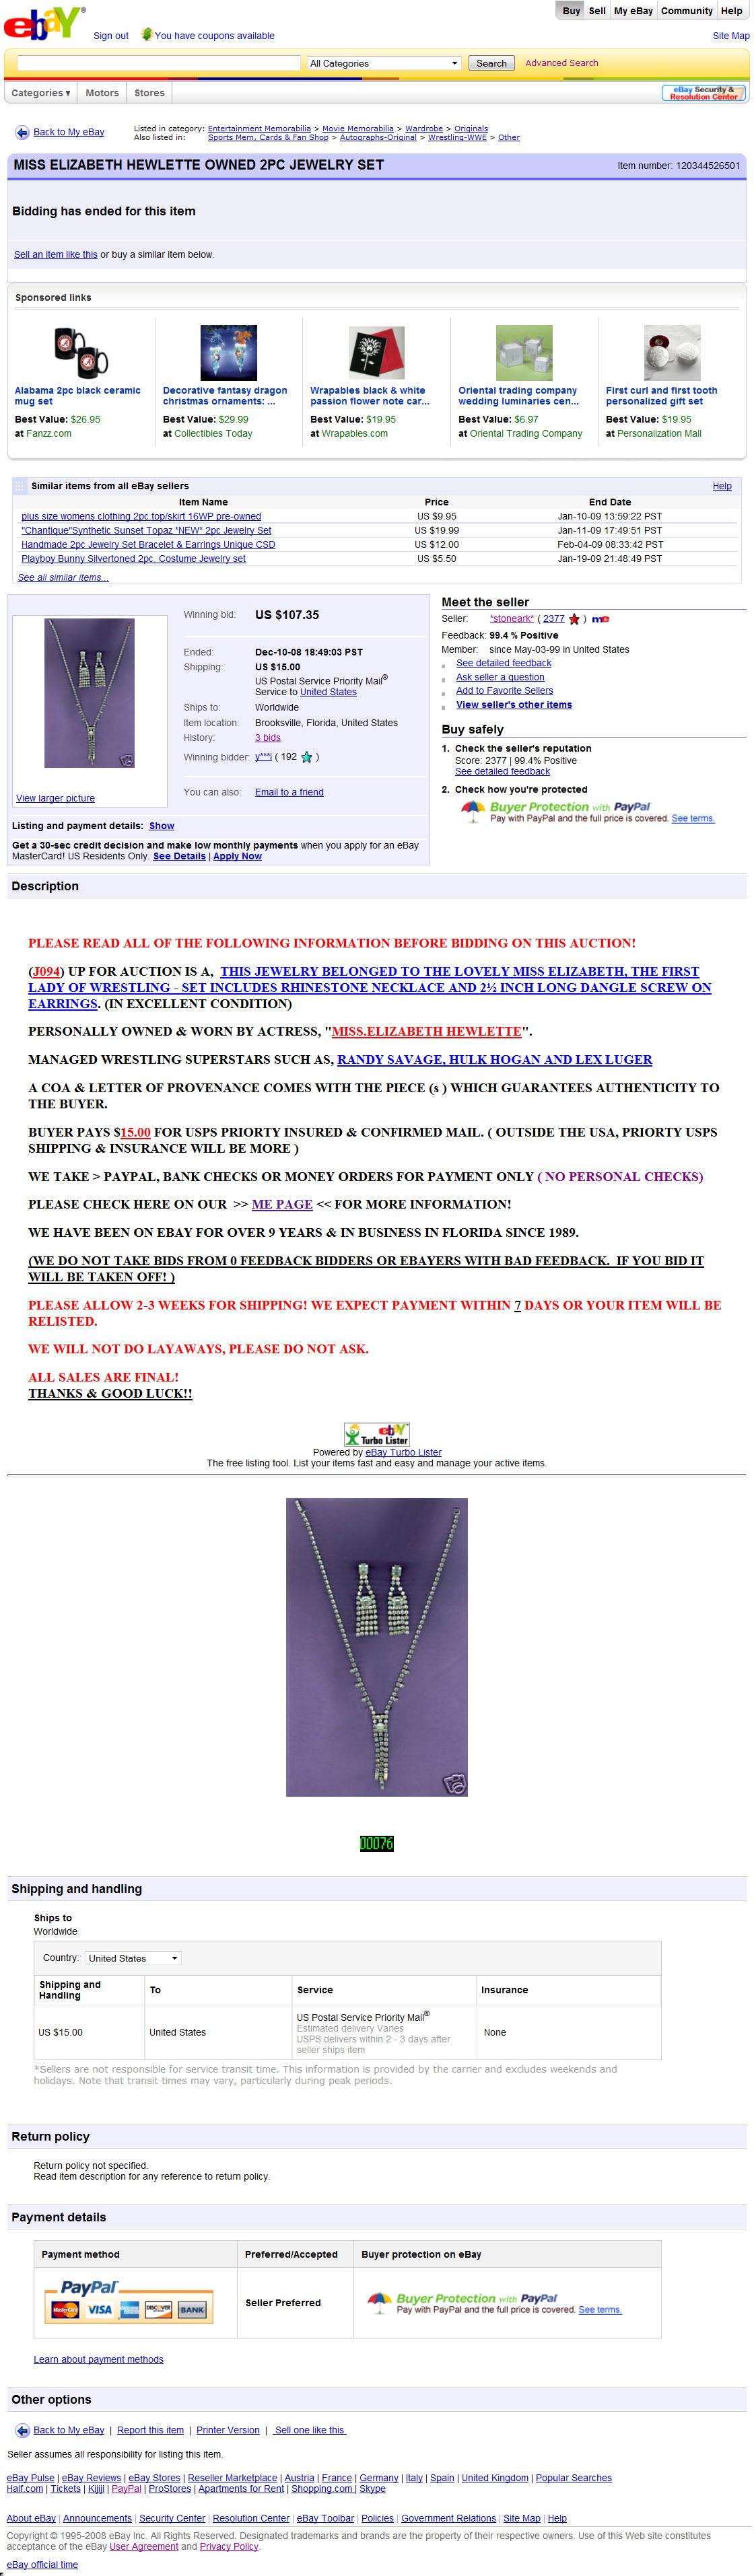 Ebay Cancel Bid Miss Elizabeth Hewlette Owned Pc Jewelry Set